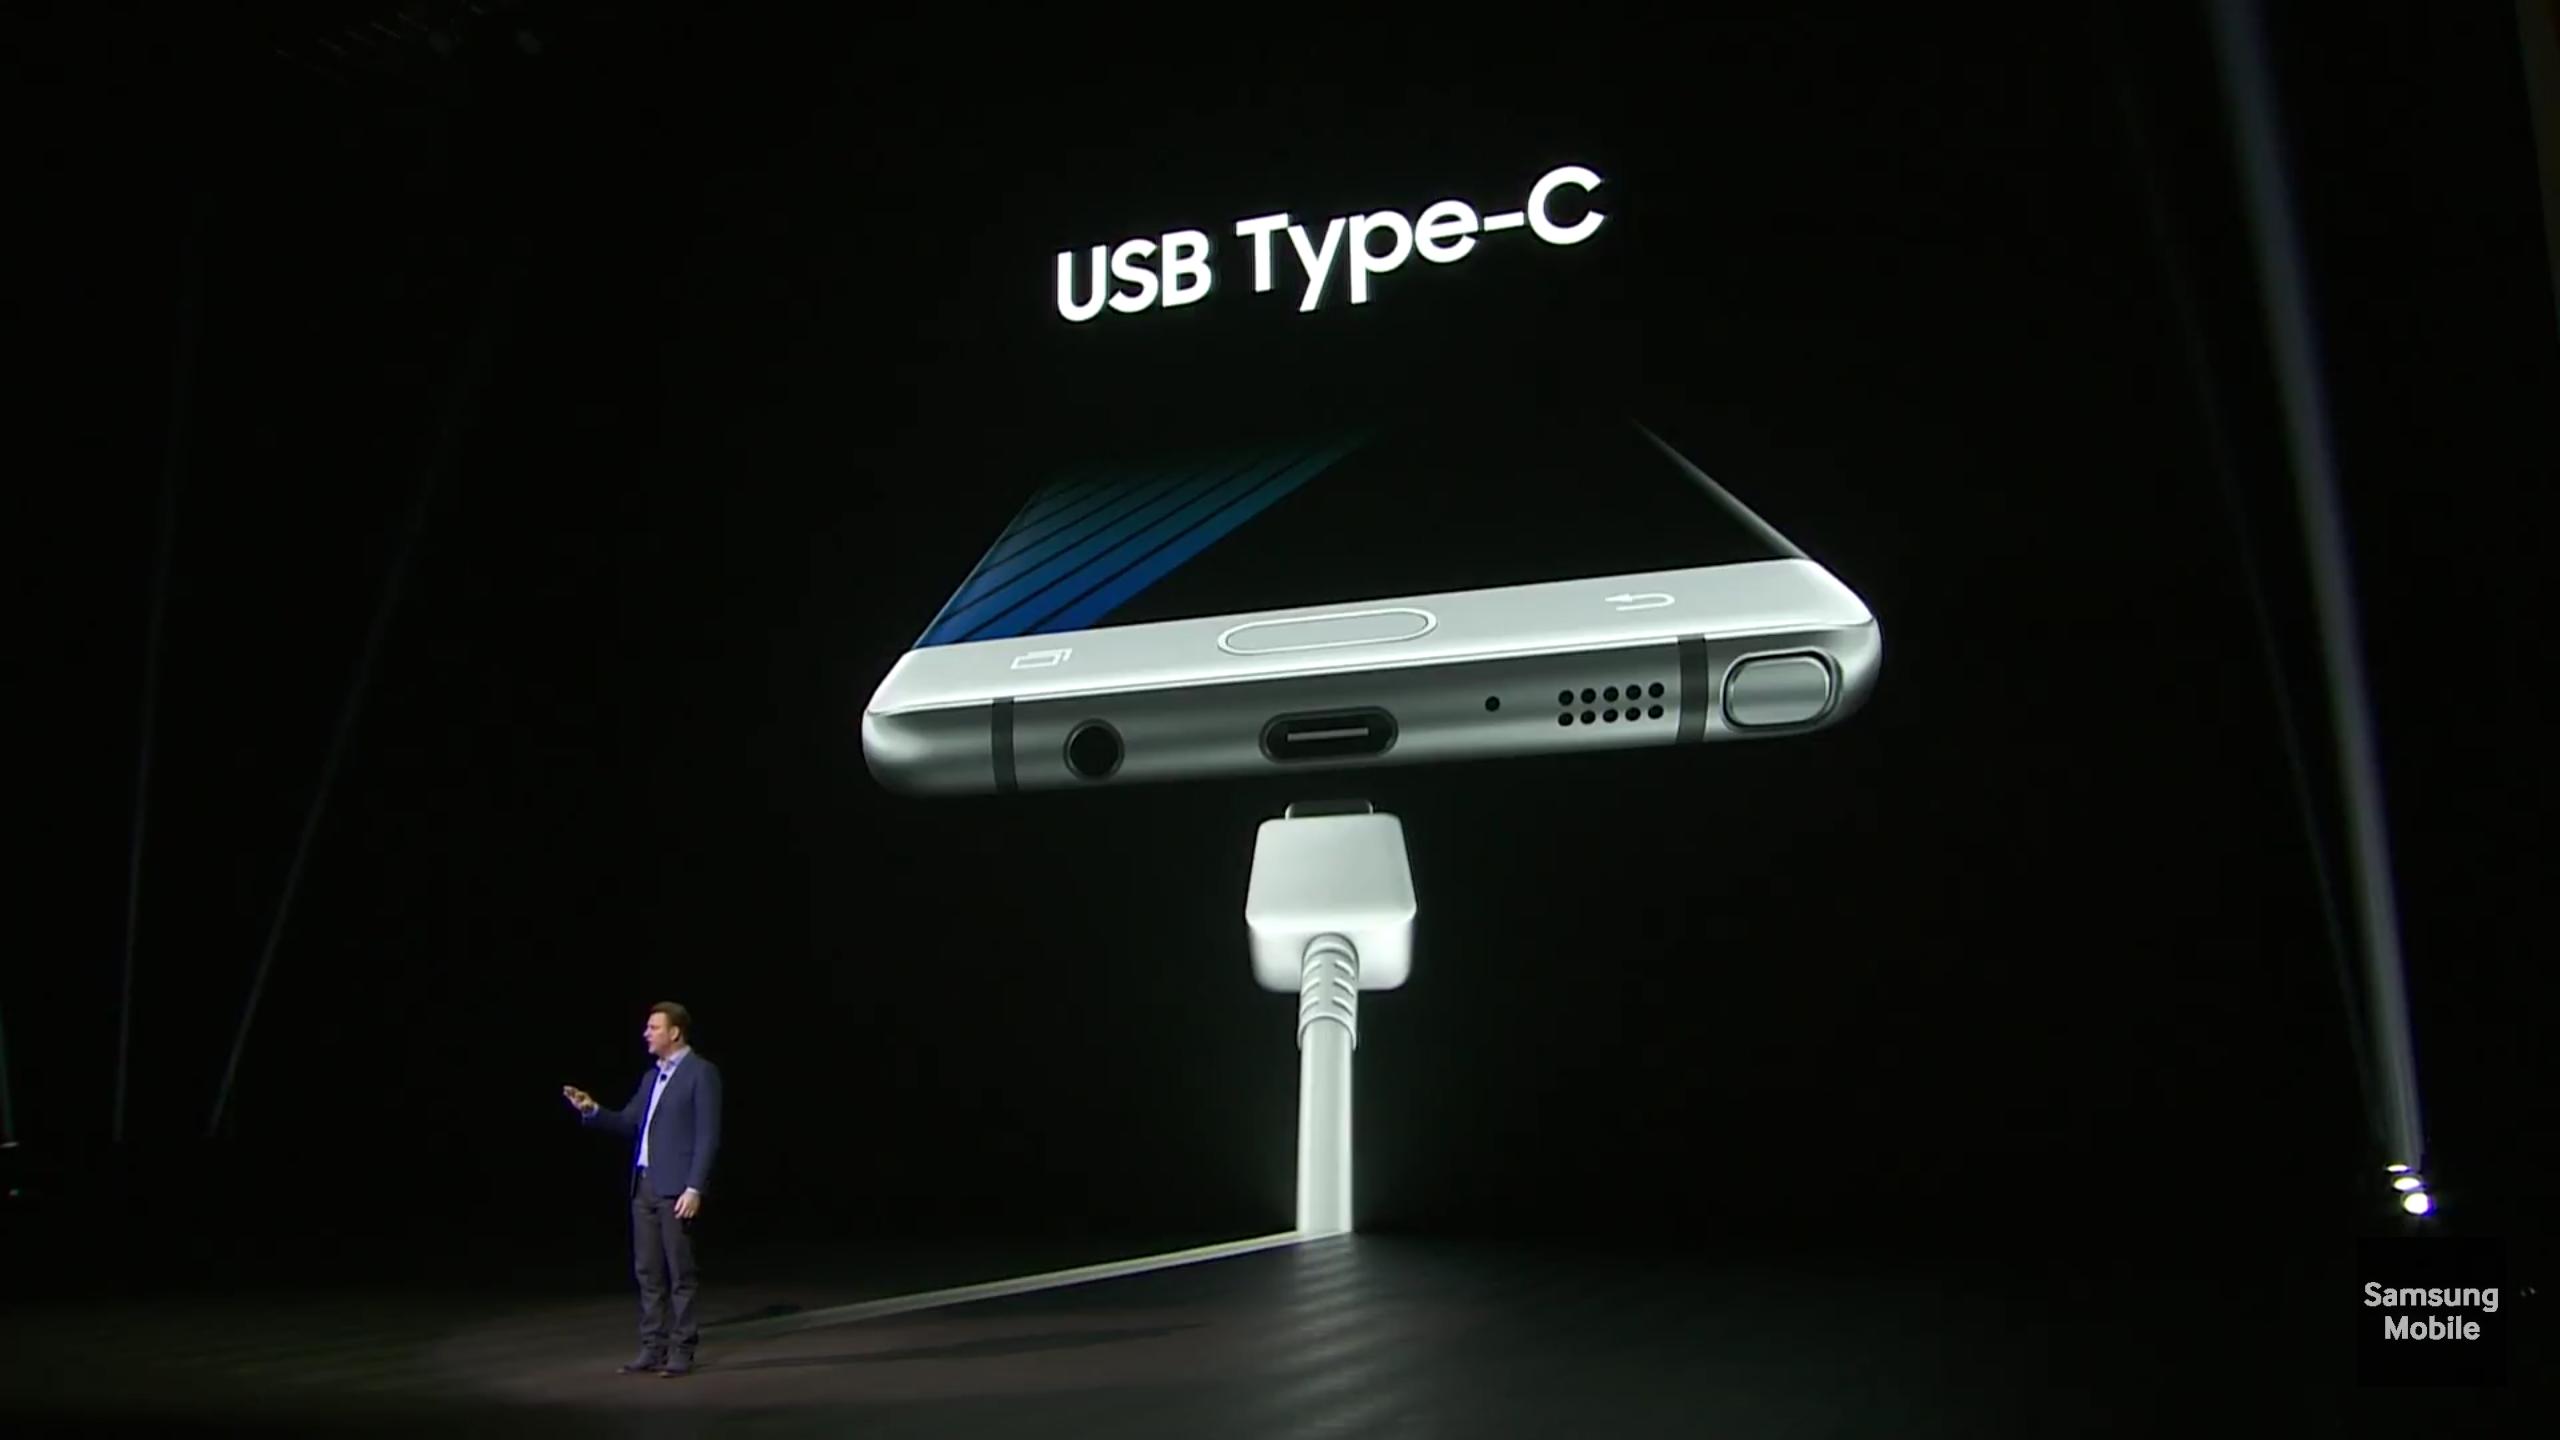 best service b89a9 24b96 Intel supports iPhone 7 headphone jack removal - AptGadget.com